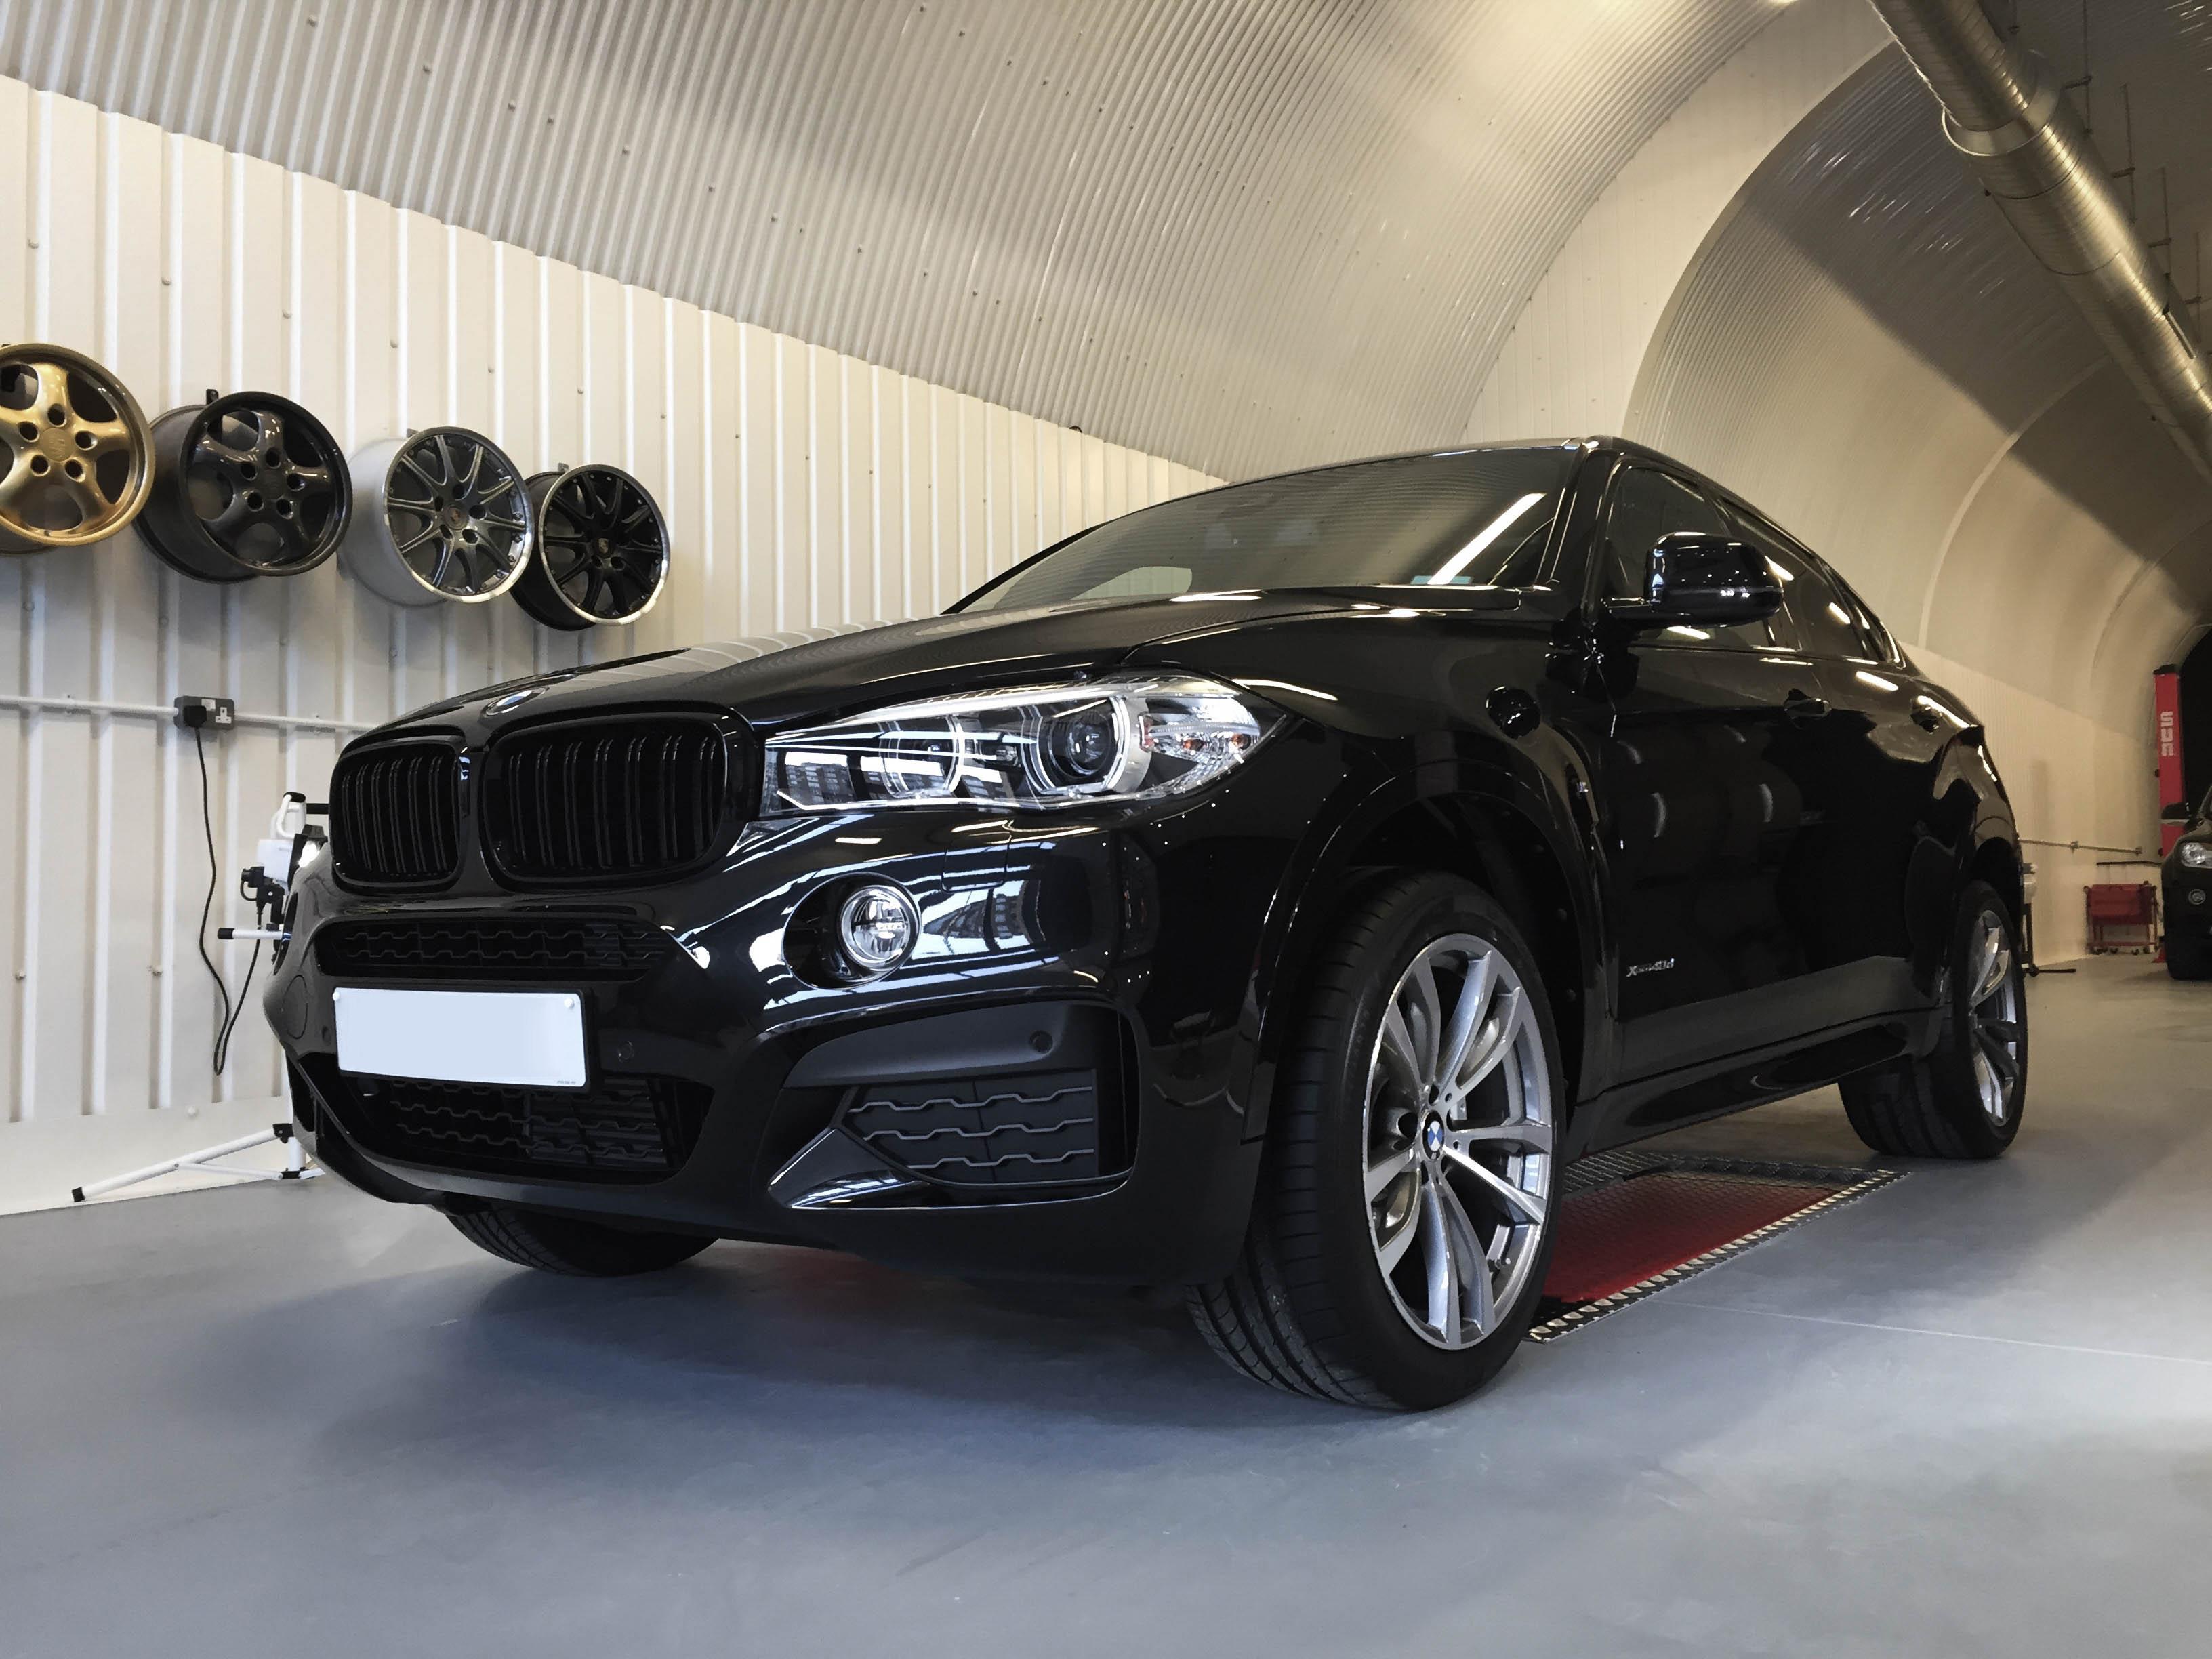 BMW X6 – Front passenger side